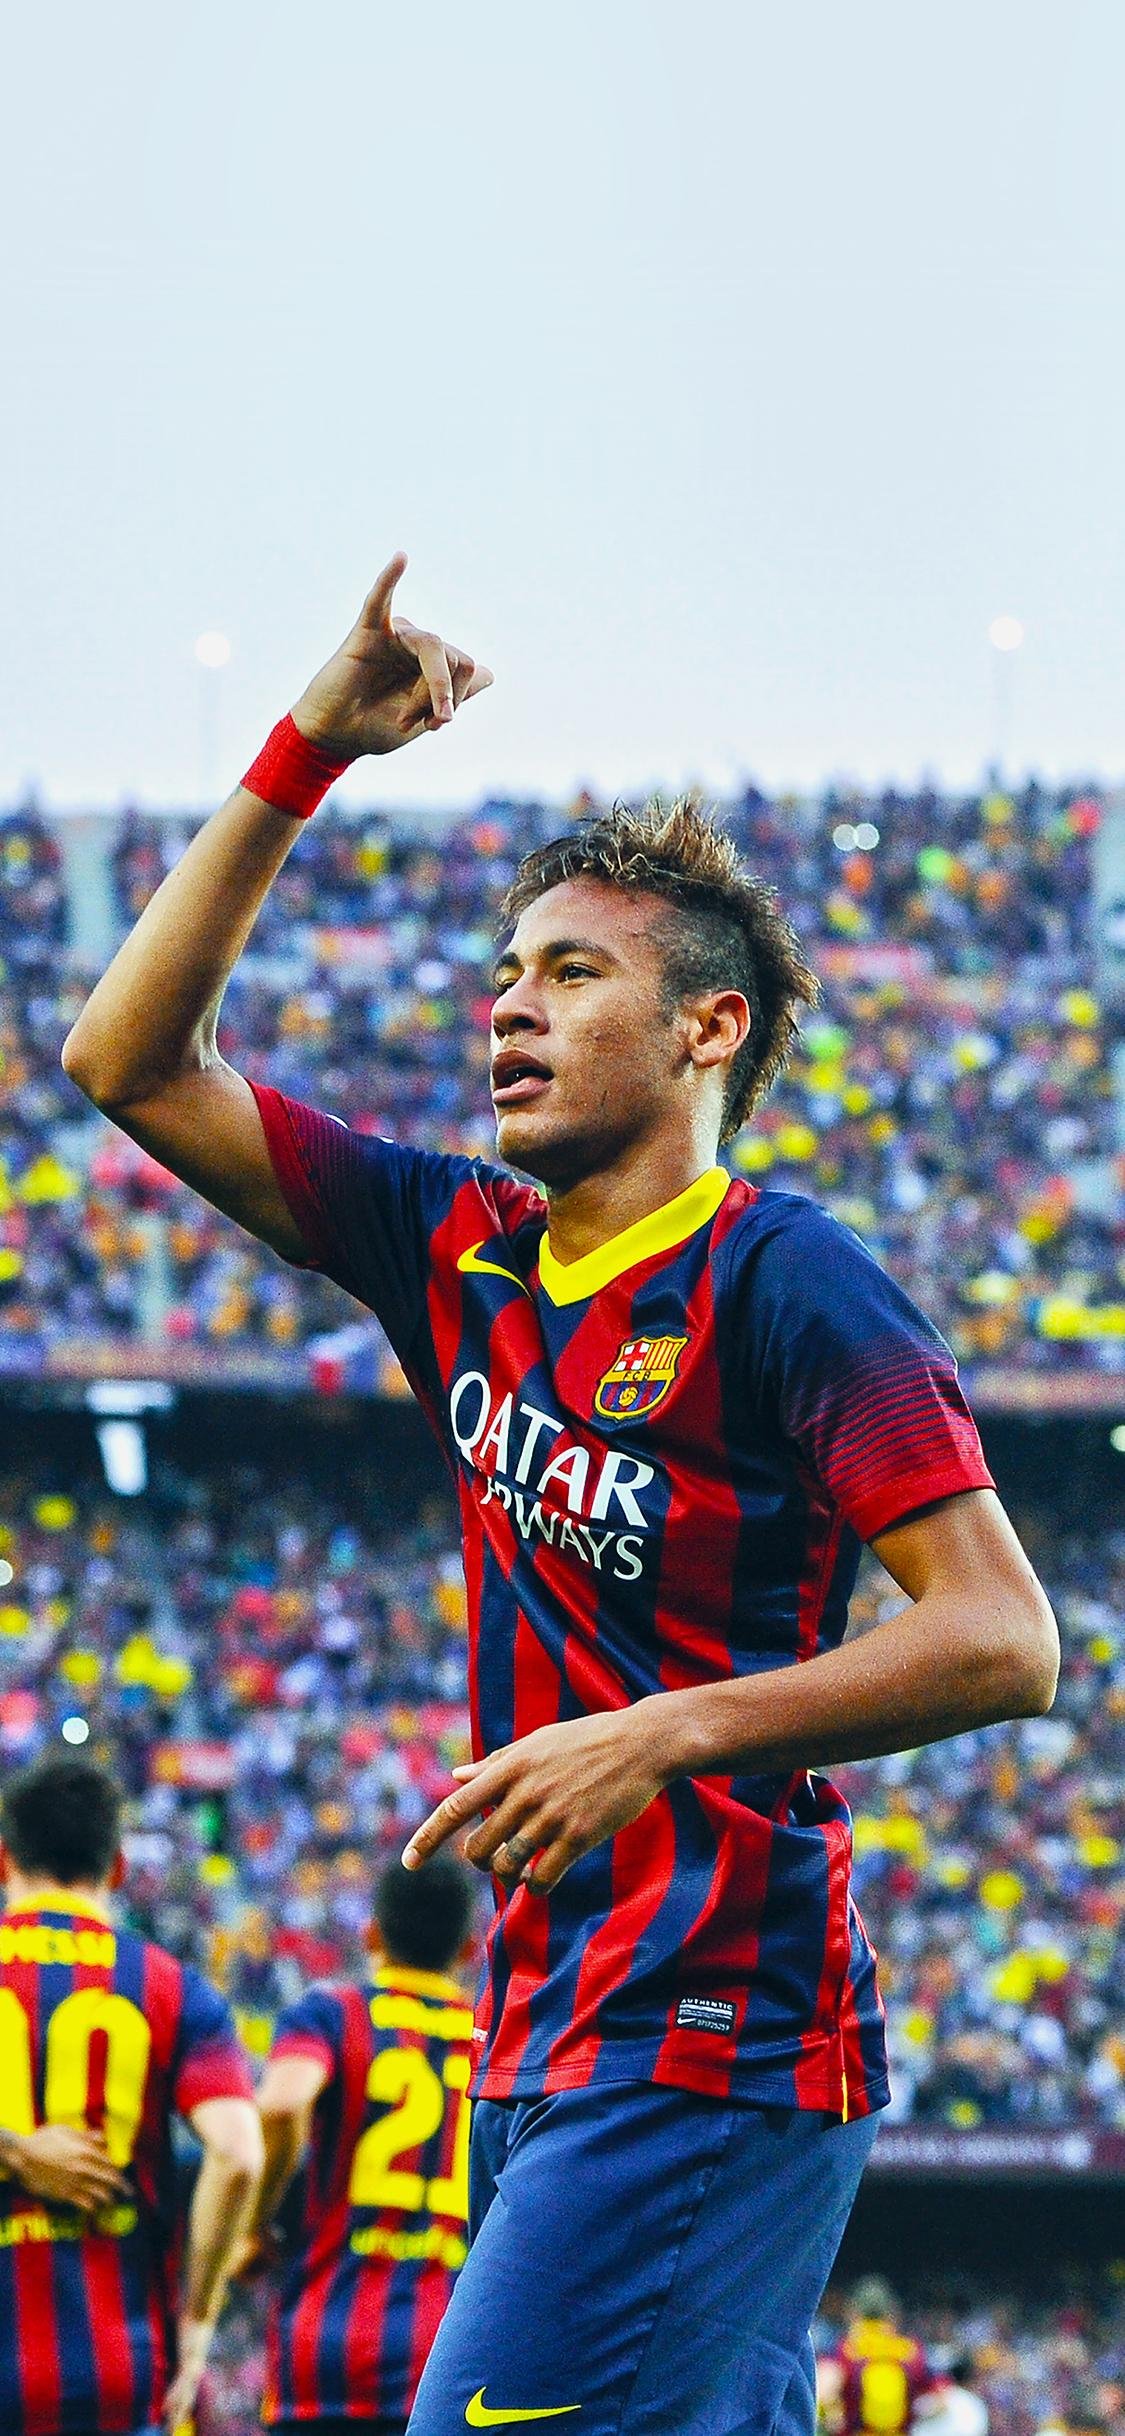 Hb18 Wallpaper Nemar Barcelona Soccer Sports Face Papers Co